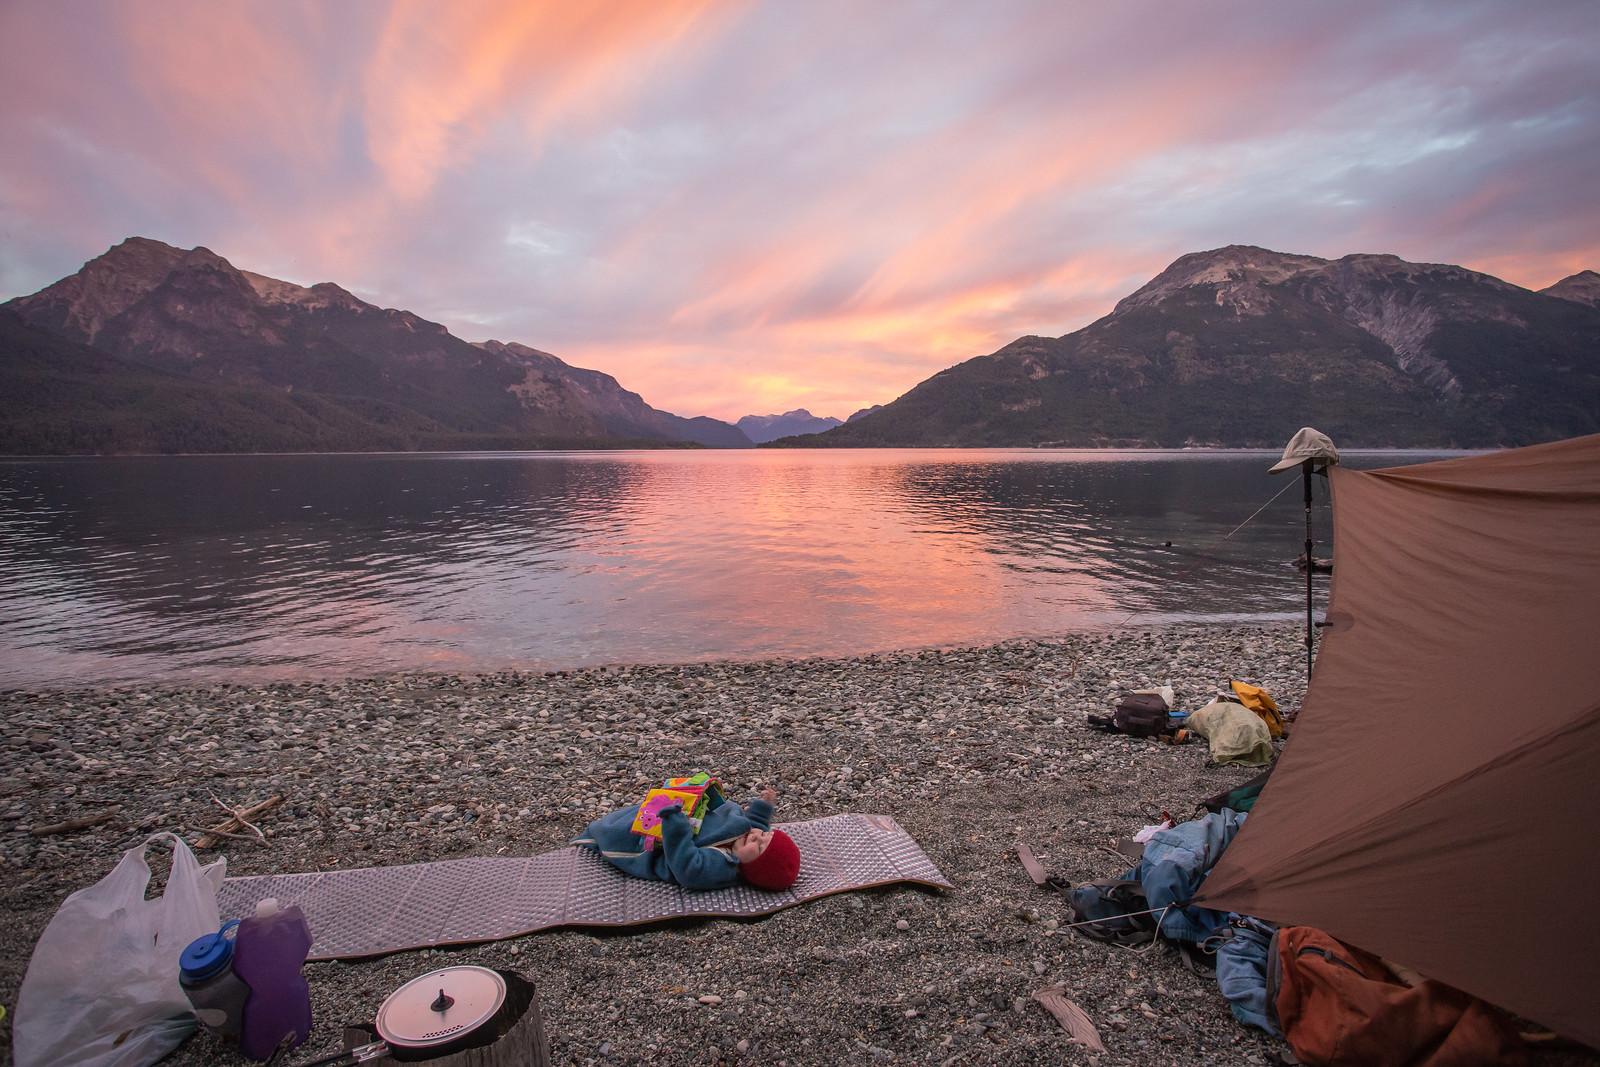 Color of Dawn. Bivaouc. Lago Futalaufquen. NP Los Alerces. Chubut. Patagonia. Argentina